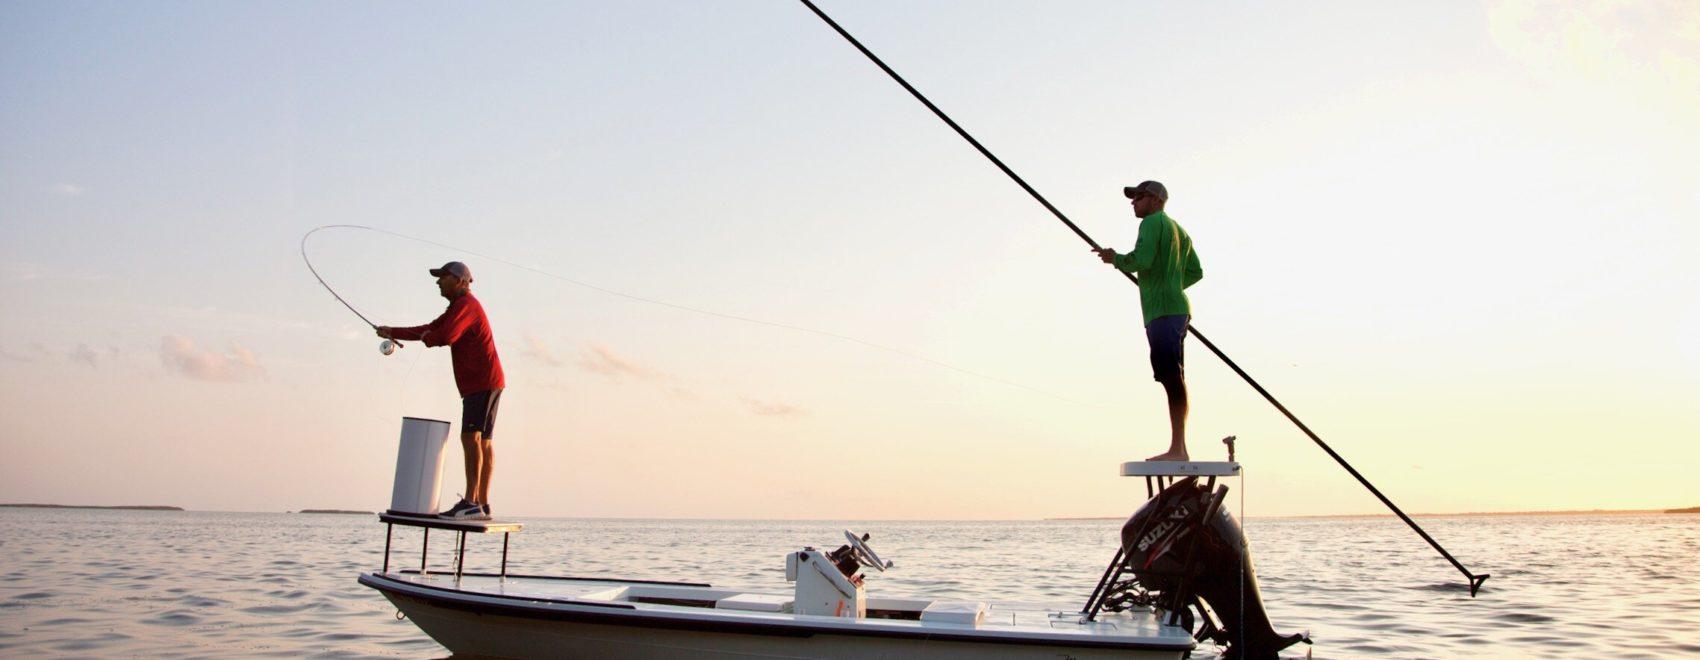 Fishing Trips and Rates in Islamorada with Captain Mark Cockerham